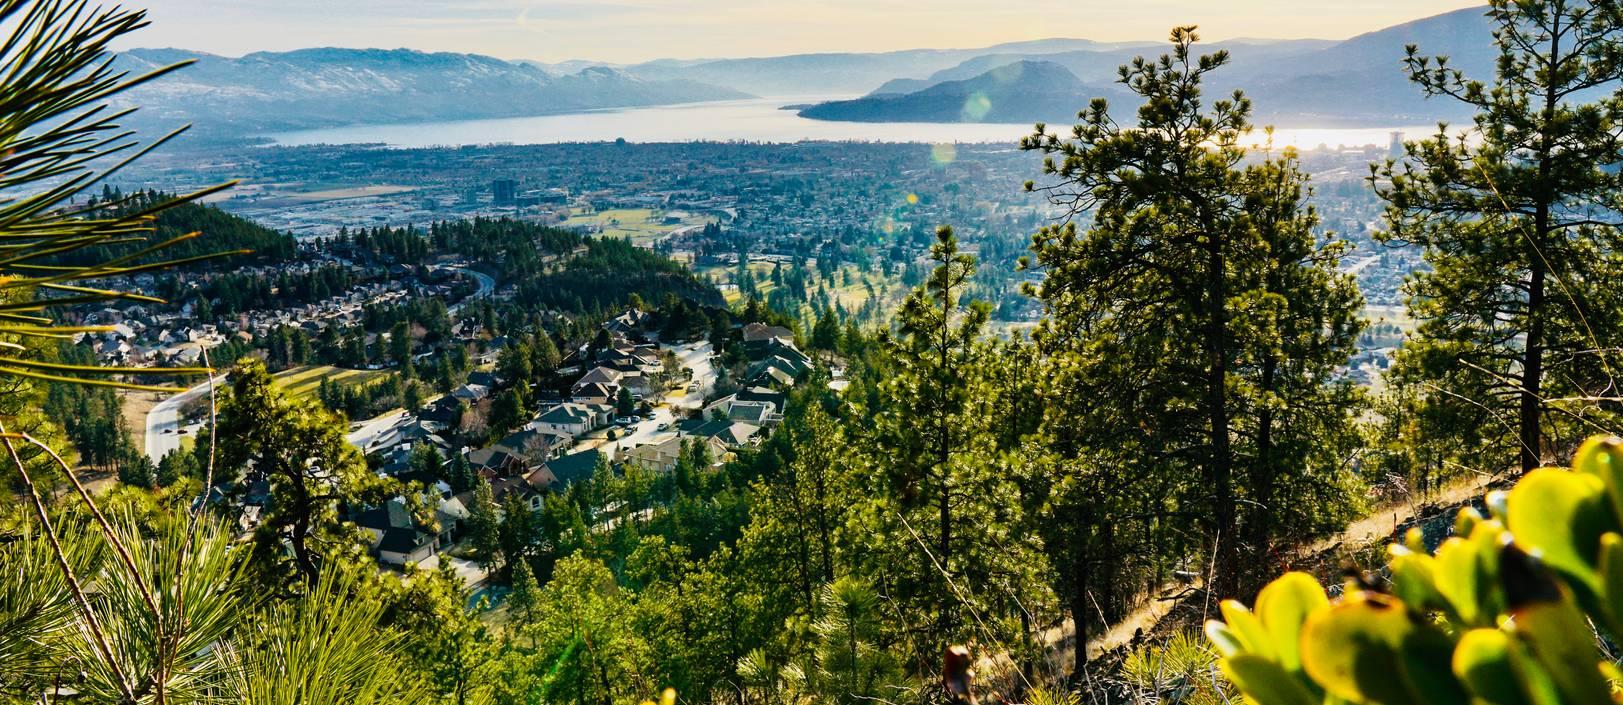 Dilworth Mountain Water Tower Hike Kelowna, BC